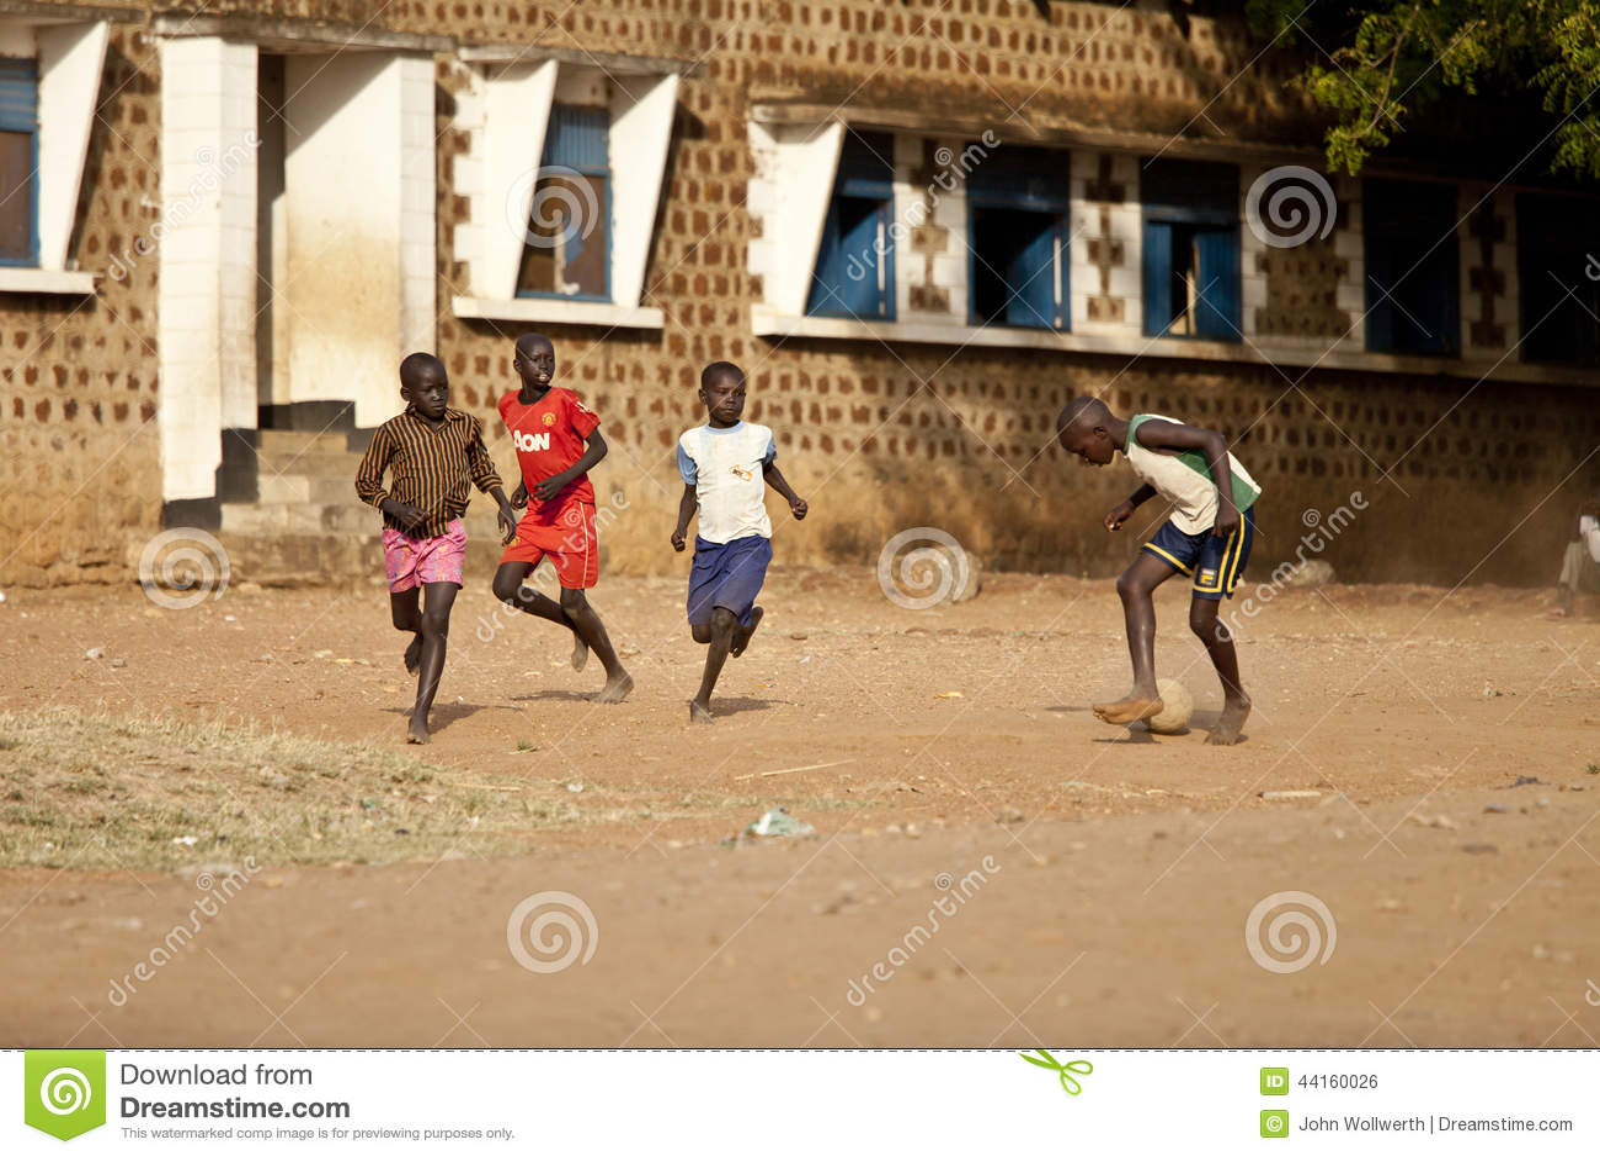 Boys playing soccer, South Sudan